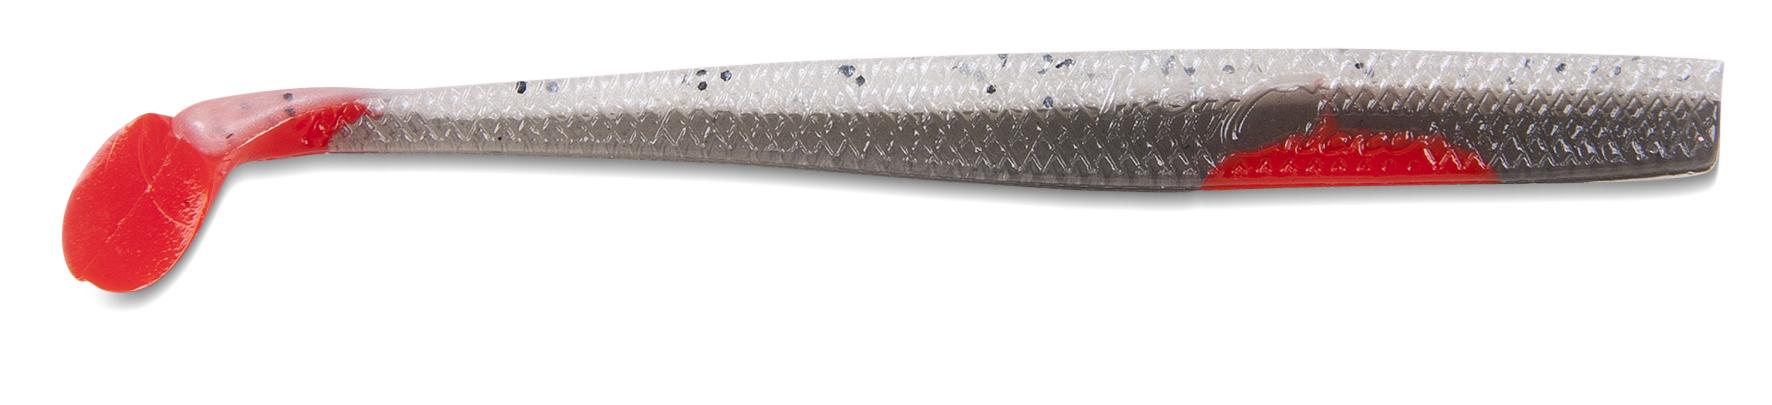 Iron Claw gumová nástraha Skinny Jake 11cm Vzor RB, 3ks